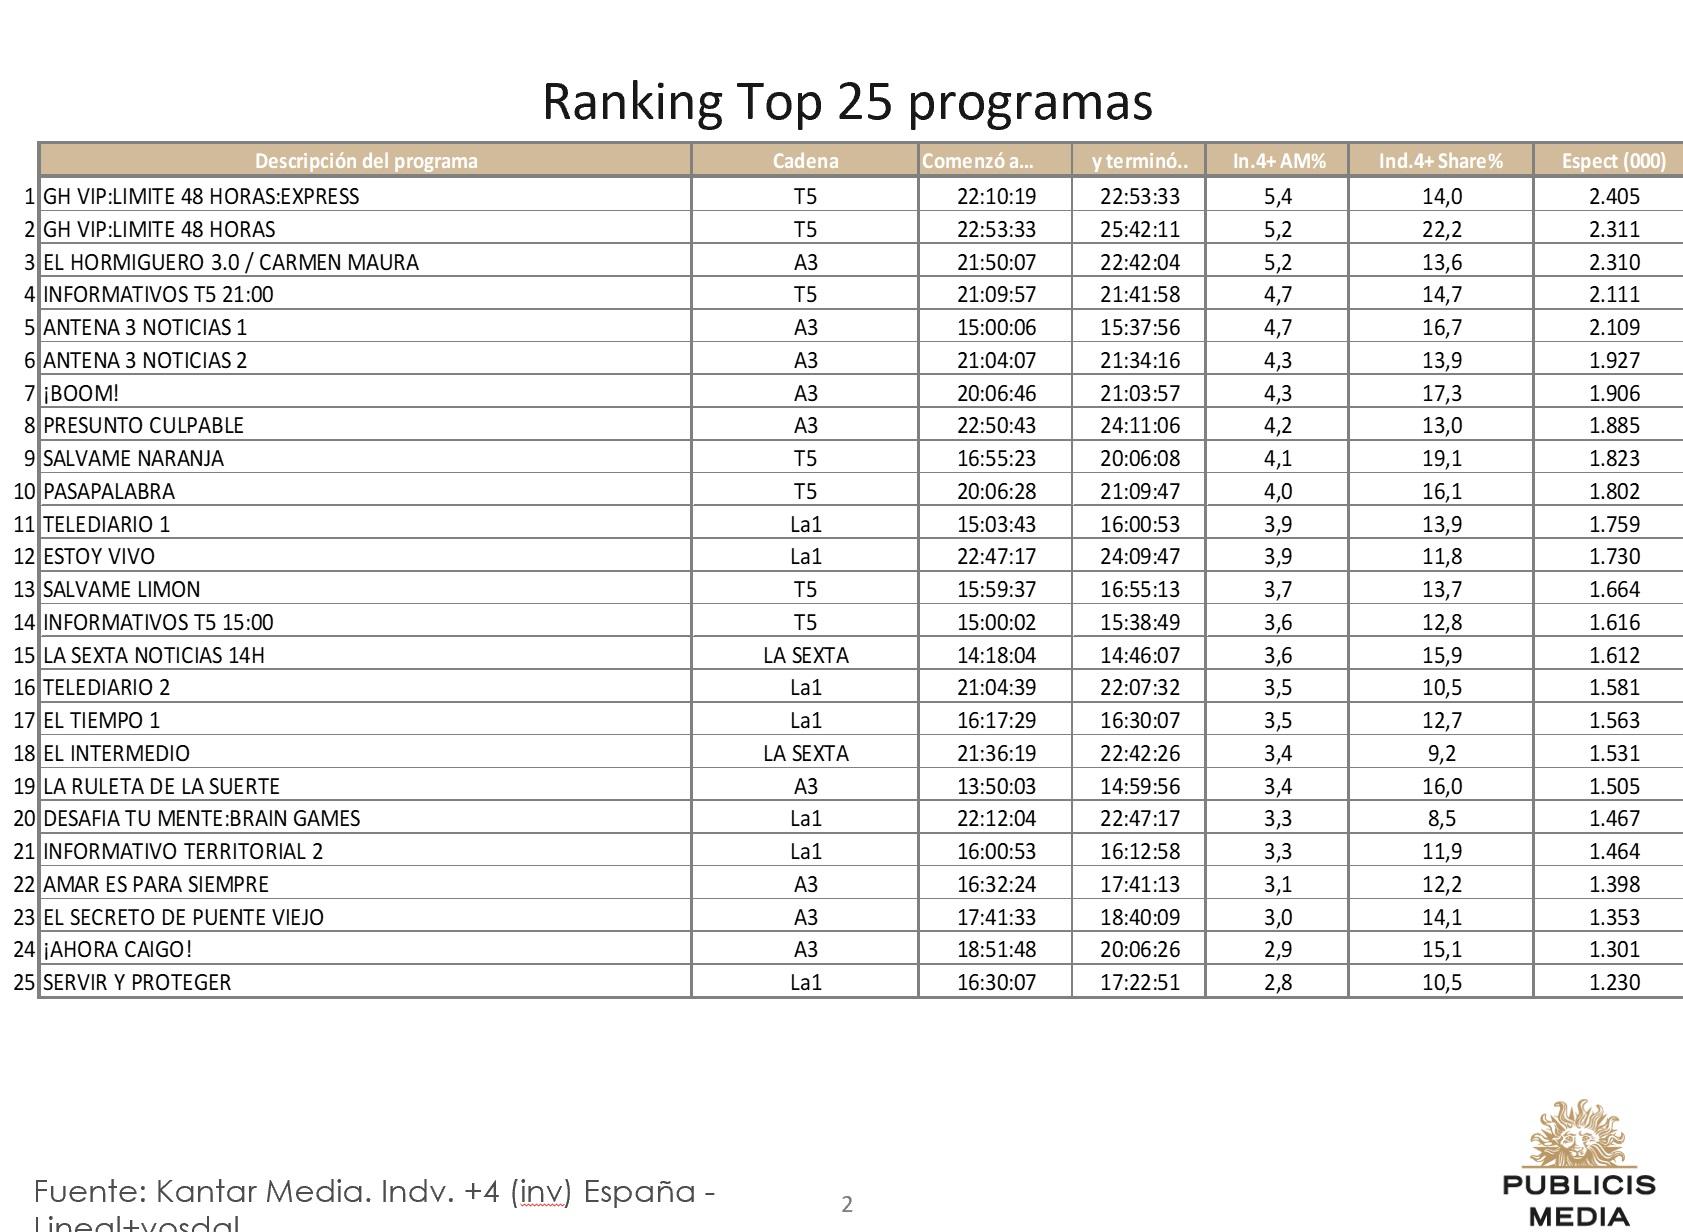 https://www.programapublicidad.com/wp-content/uploads/2018/09/top-25-publicis-media-25-sep-2018-programapublicidad-muy-grande.jpg